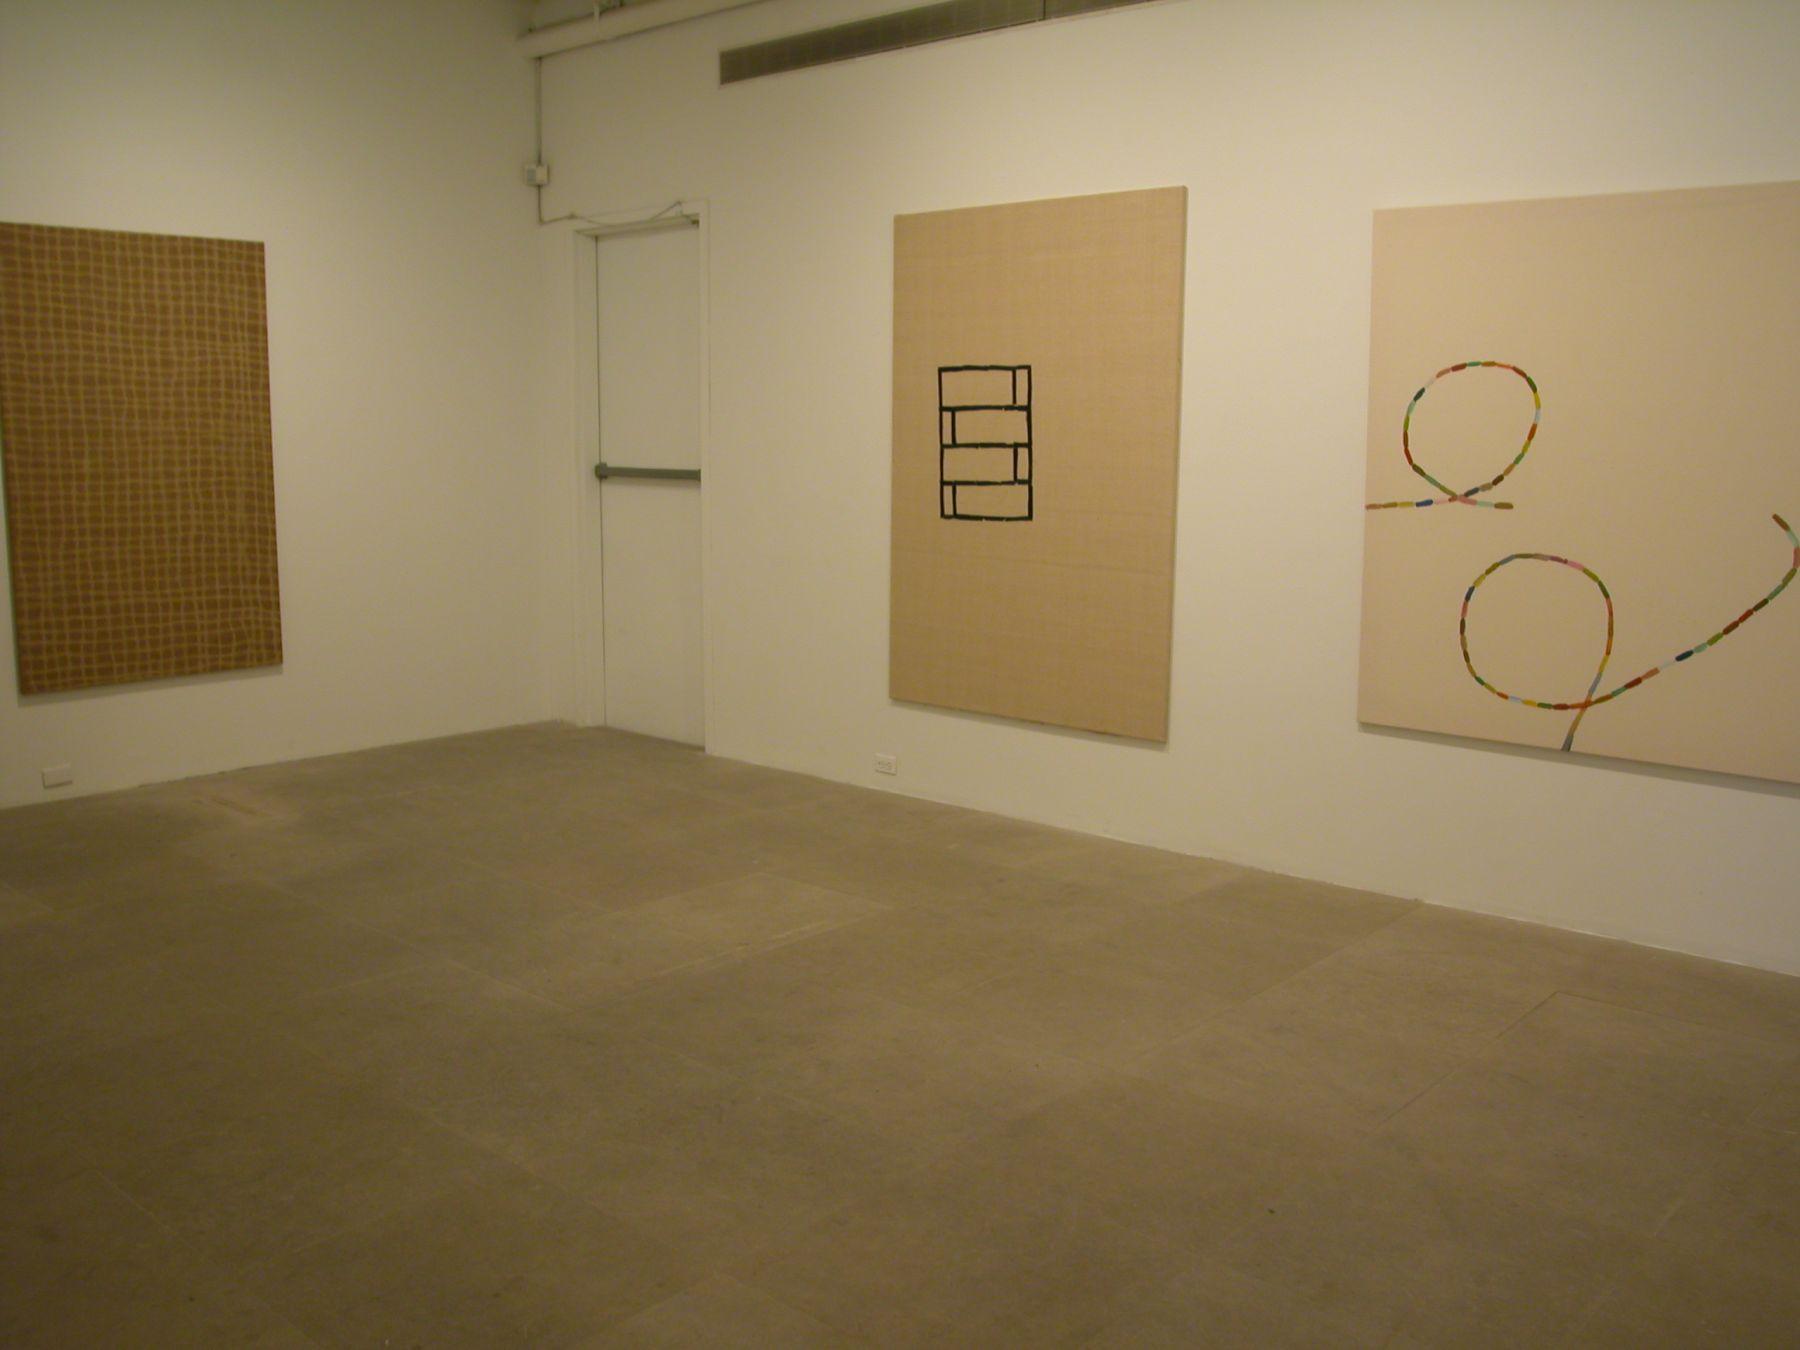 Installation view, Greene Naftali, New York, 2003